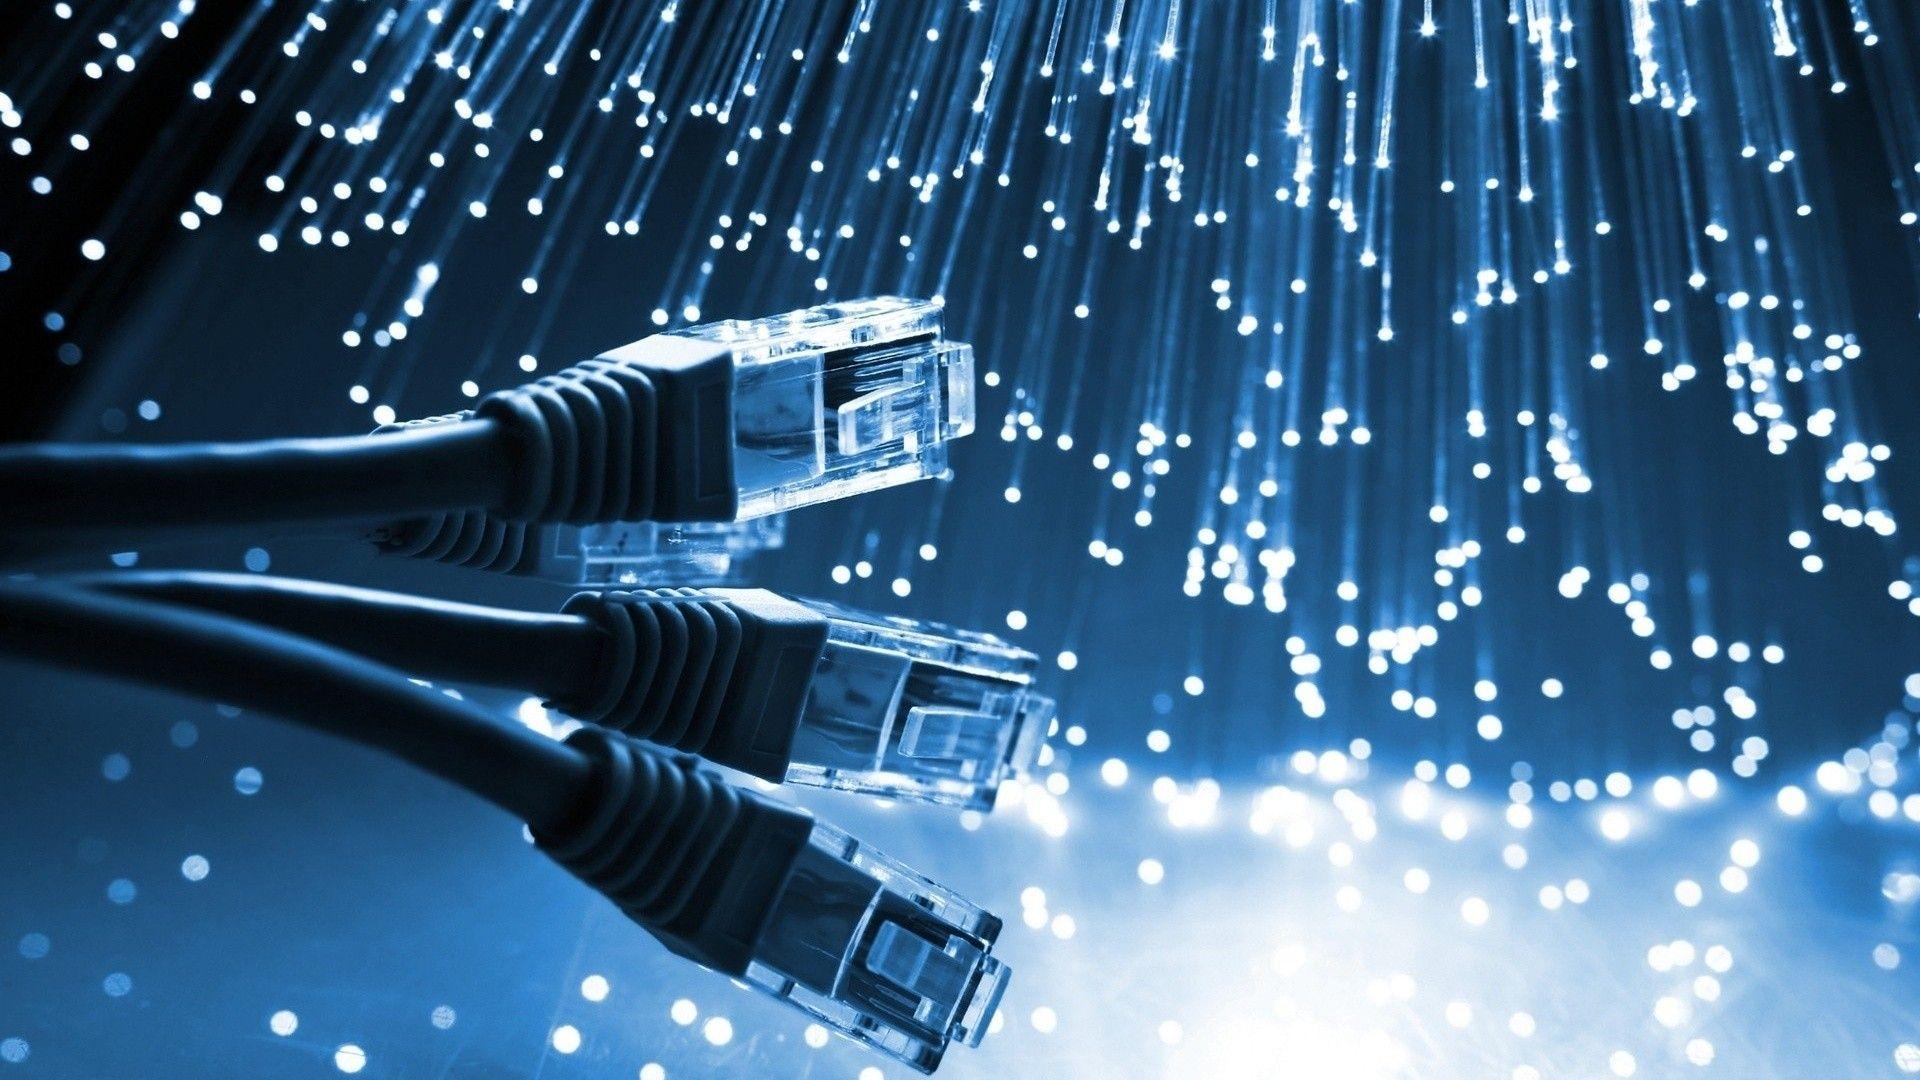 Насервере IT-подрядчика ФСО обнаружили вирусы для майнинга биткойнов